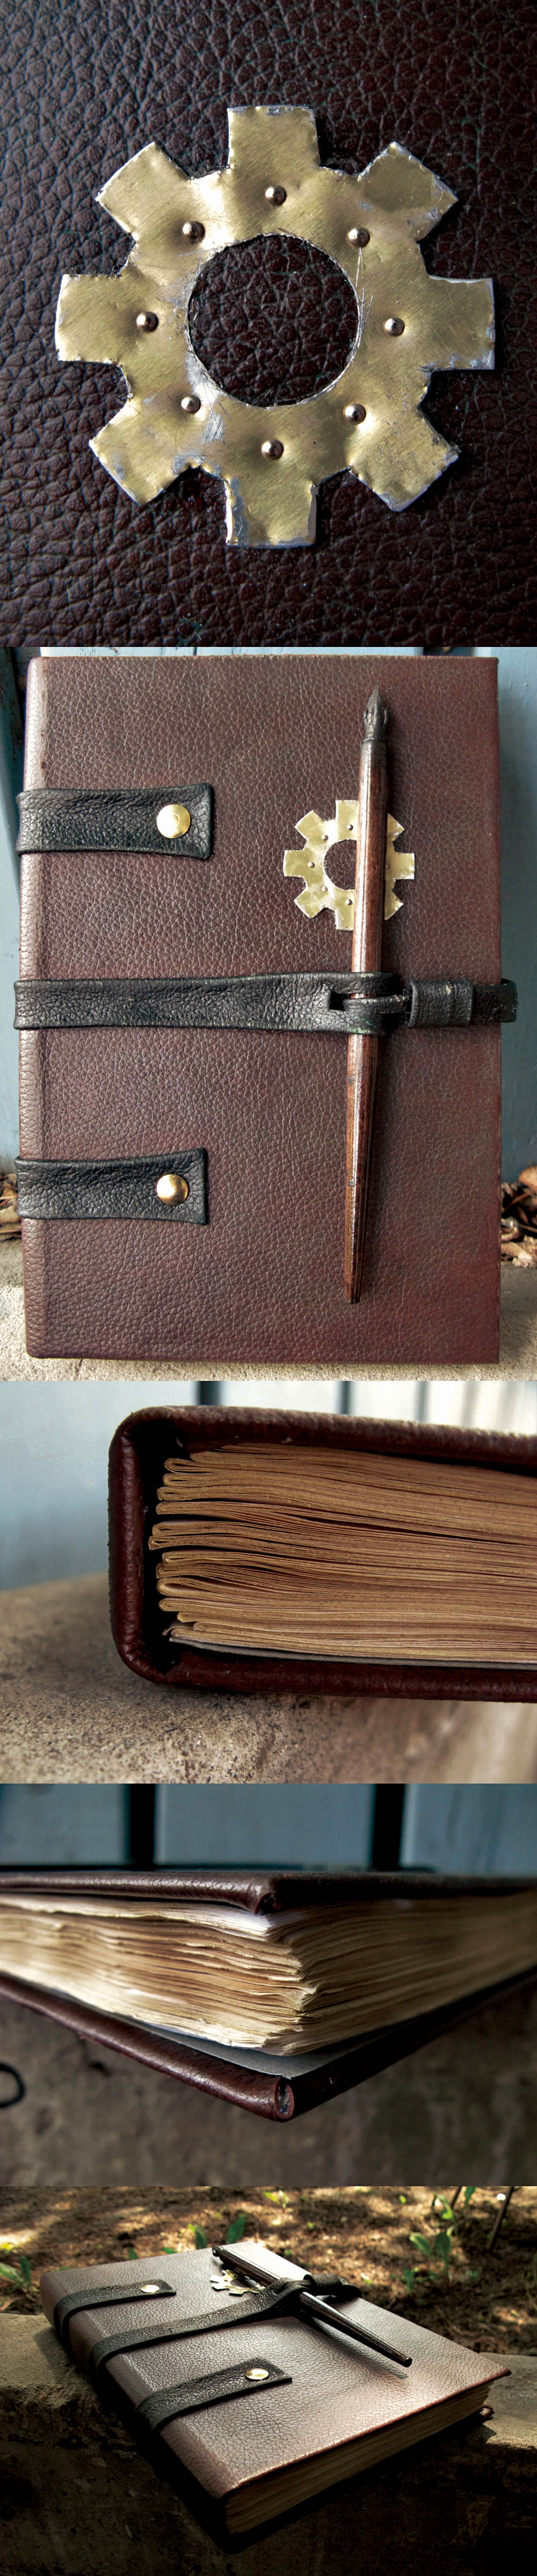 Journal II: Steampunk